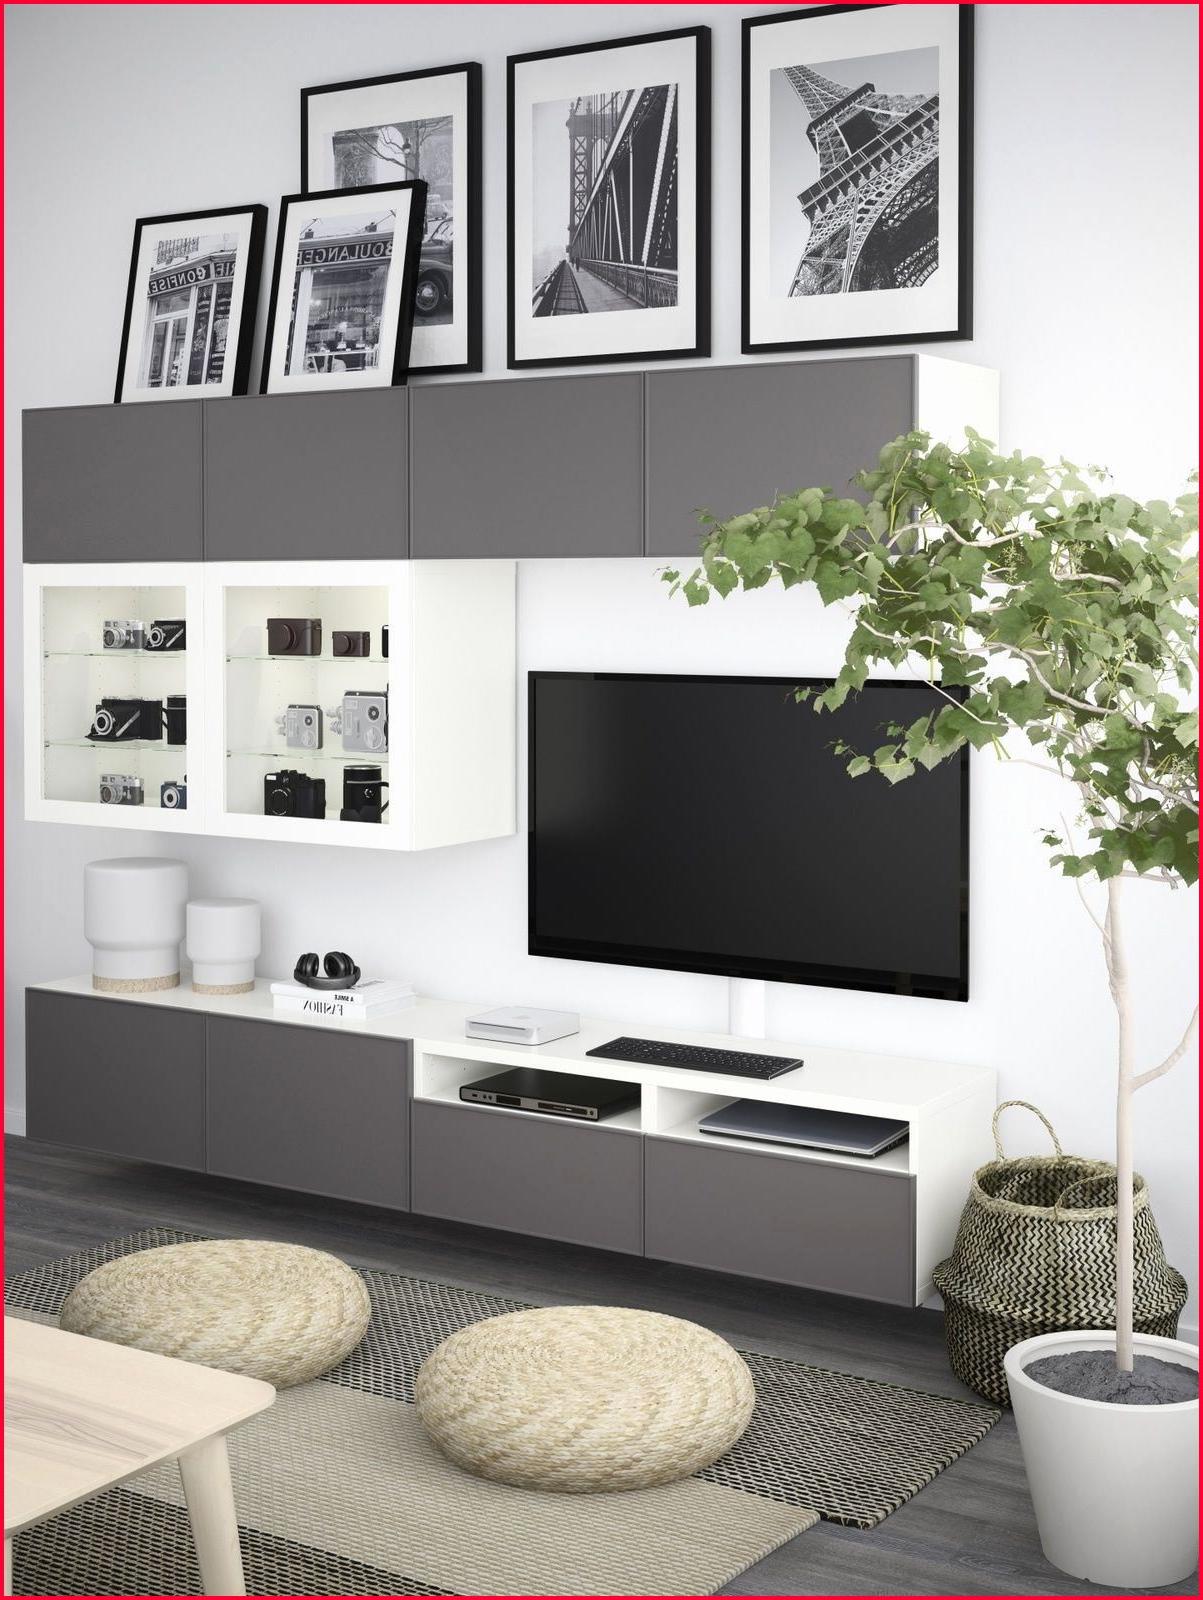 Muebles De Salon Ikea Ofertas Kvdd Muebles De Salon Ikea Ofertas Muebles De Salon Ikea Ertas